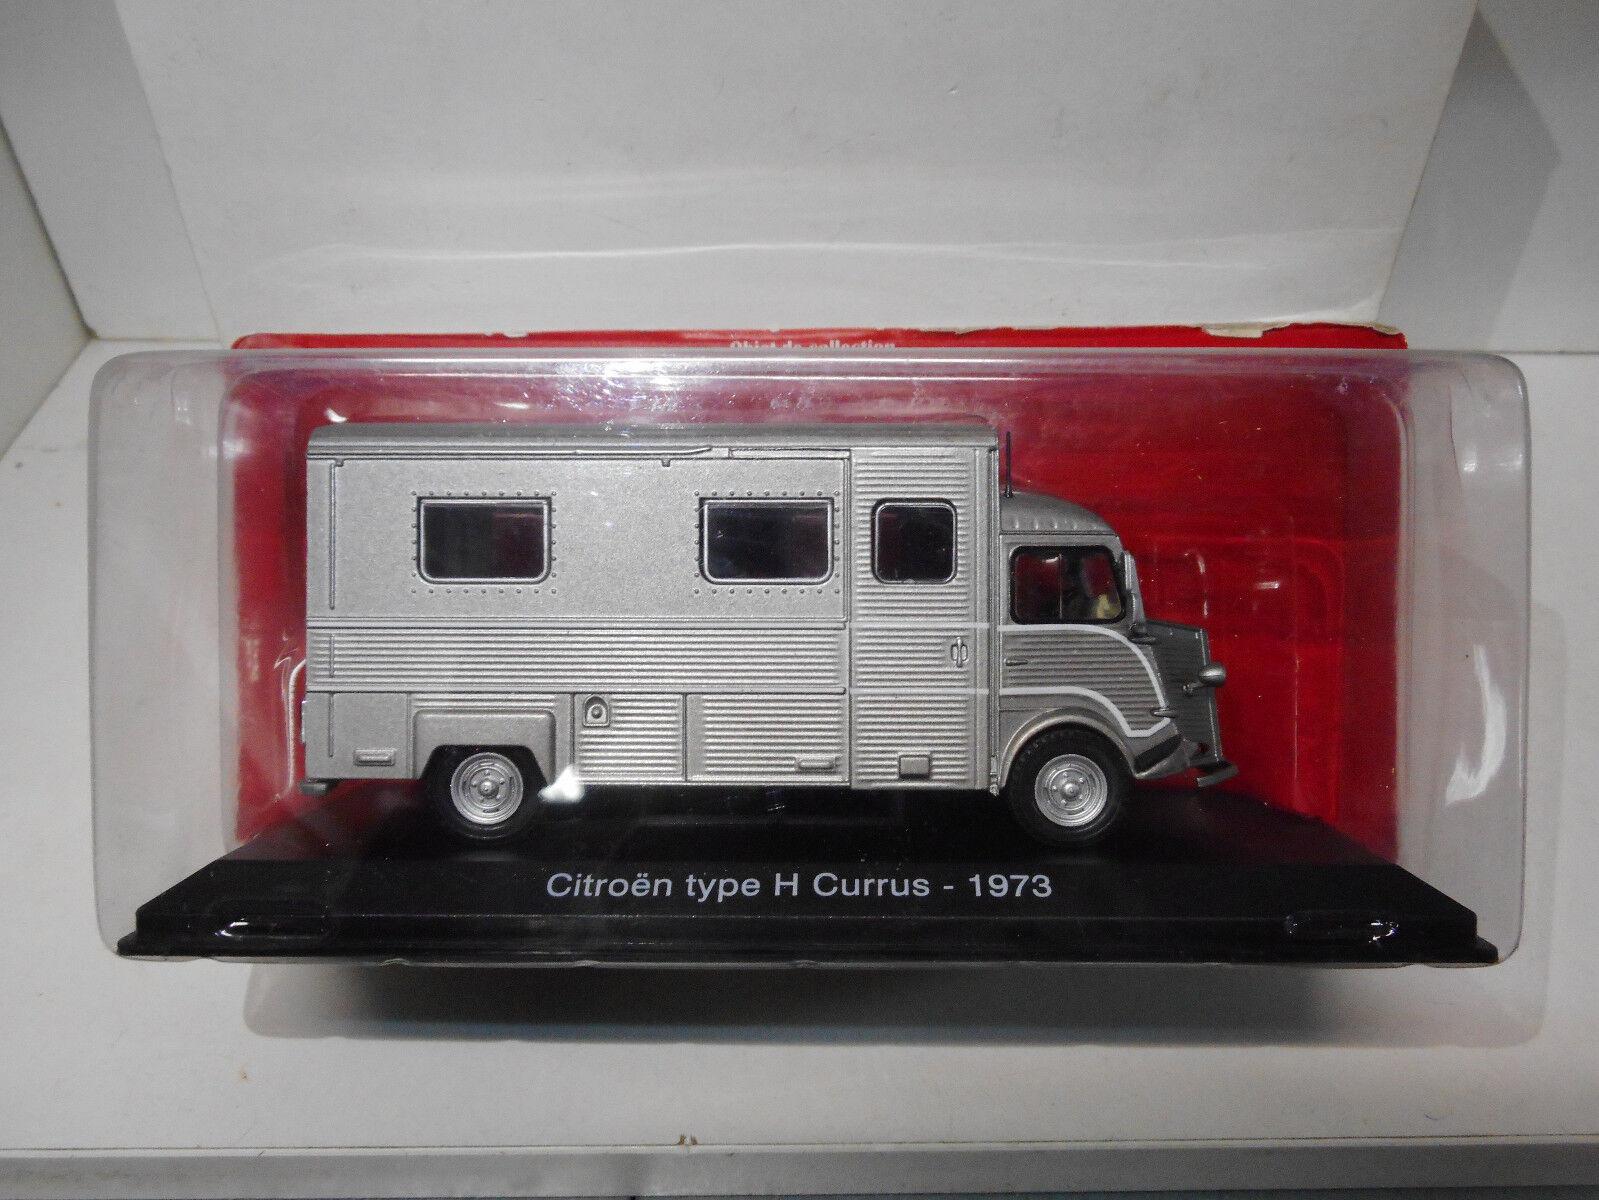 CITROEN TYPE H CURRUS 1973 1973 1973 CAMPING CAR HACHETTE 1 43 8b16bf